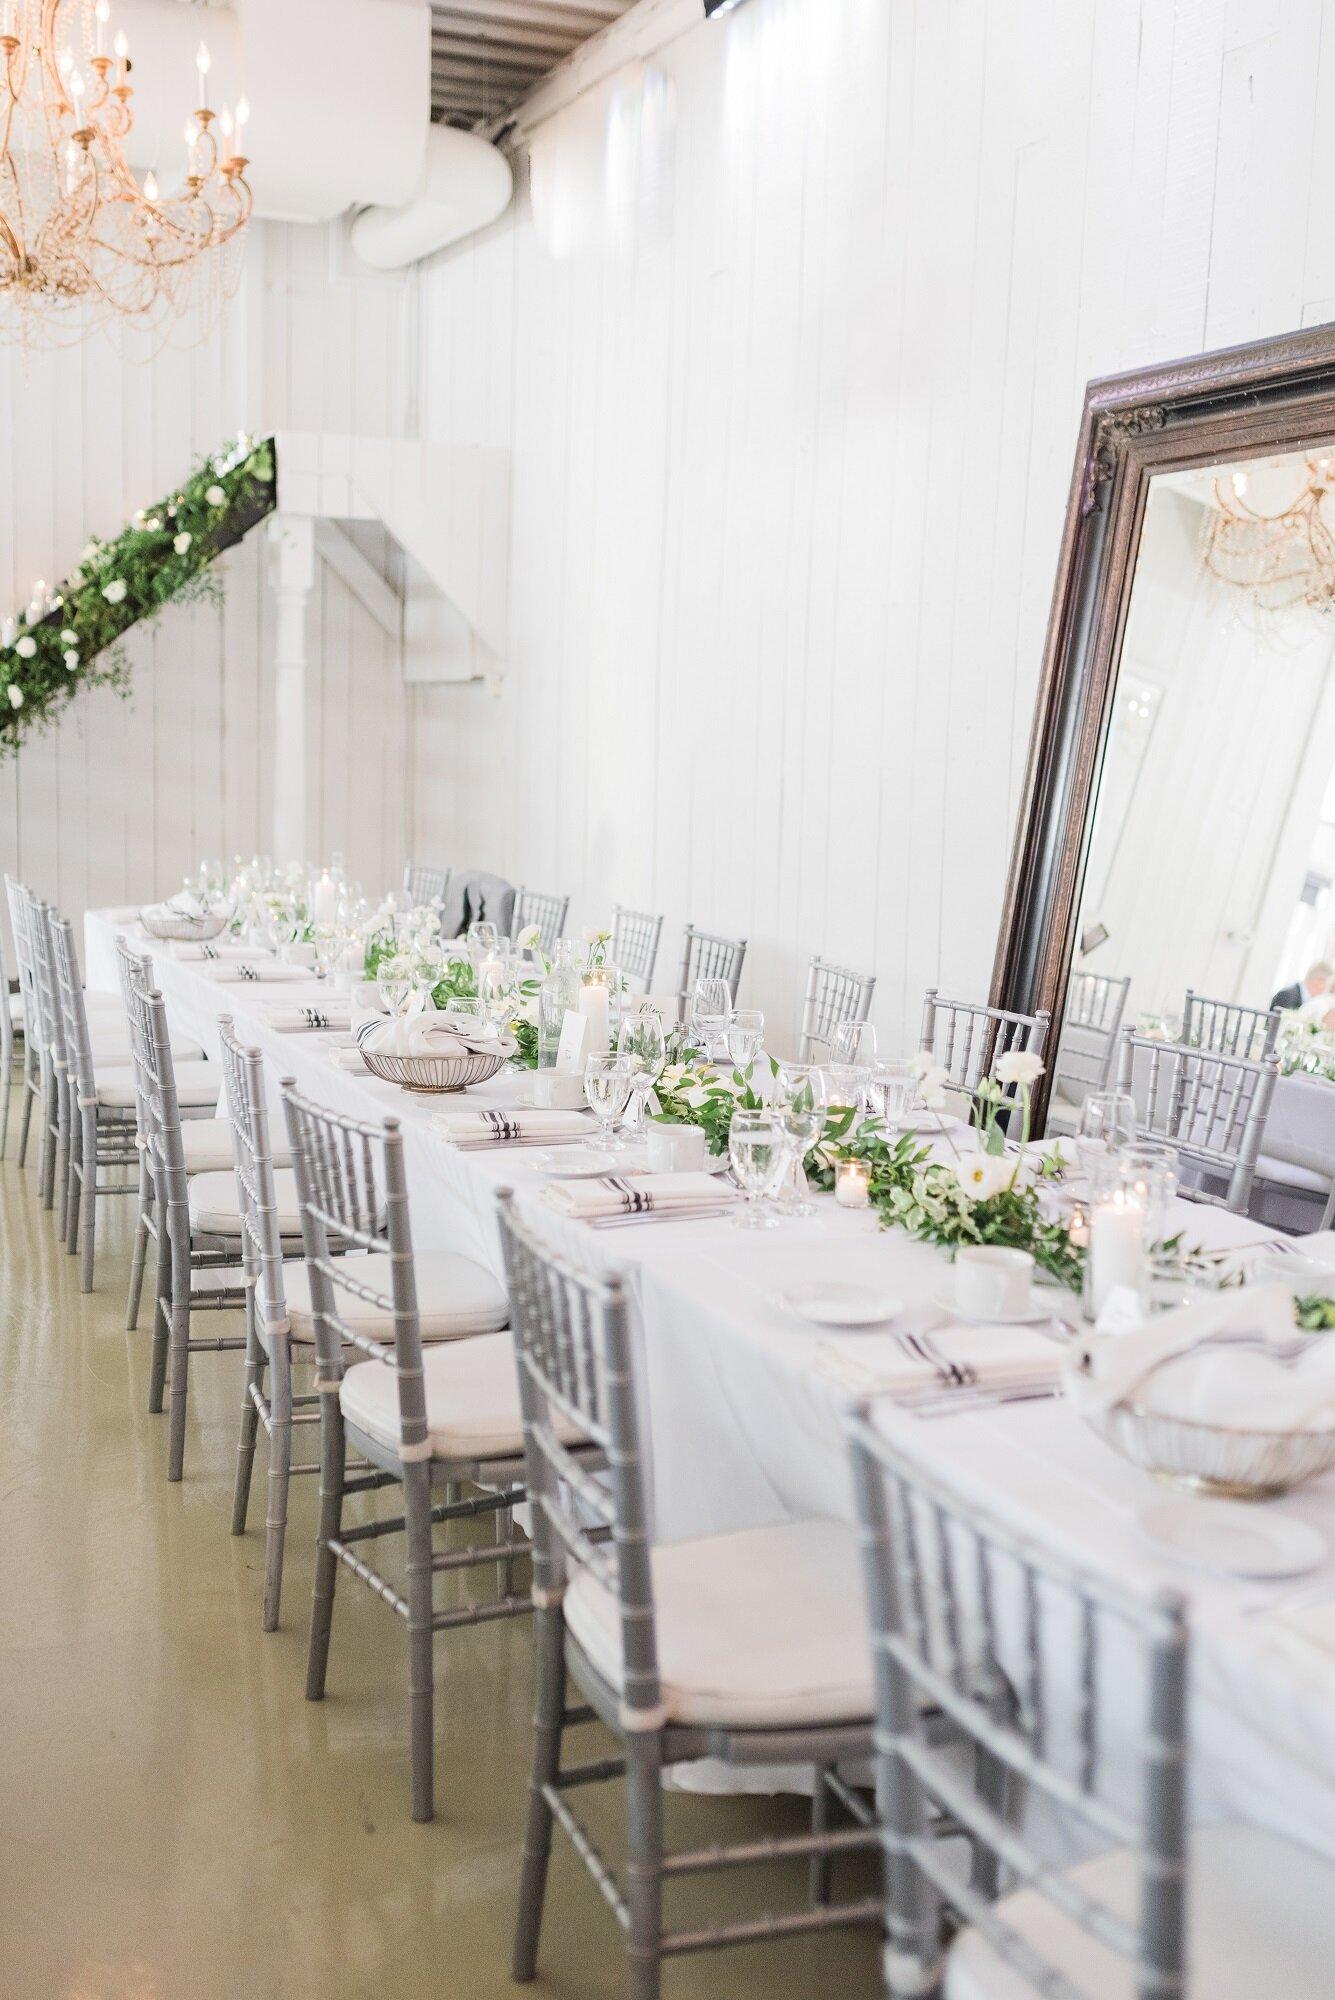 berkeley-field-house-wedding-kj-and-co-21.jpg